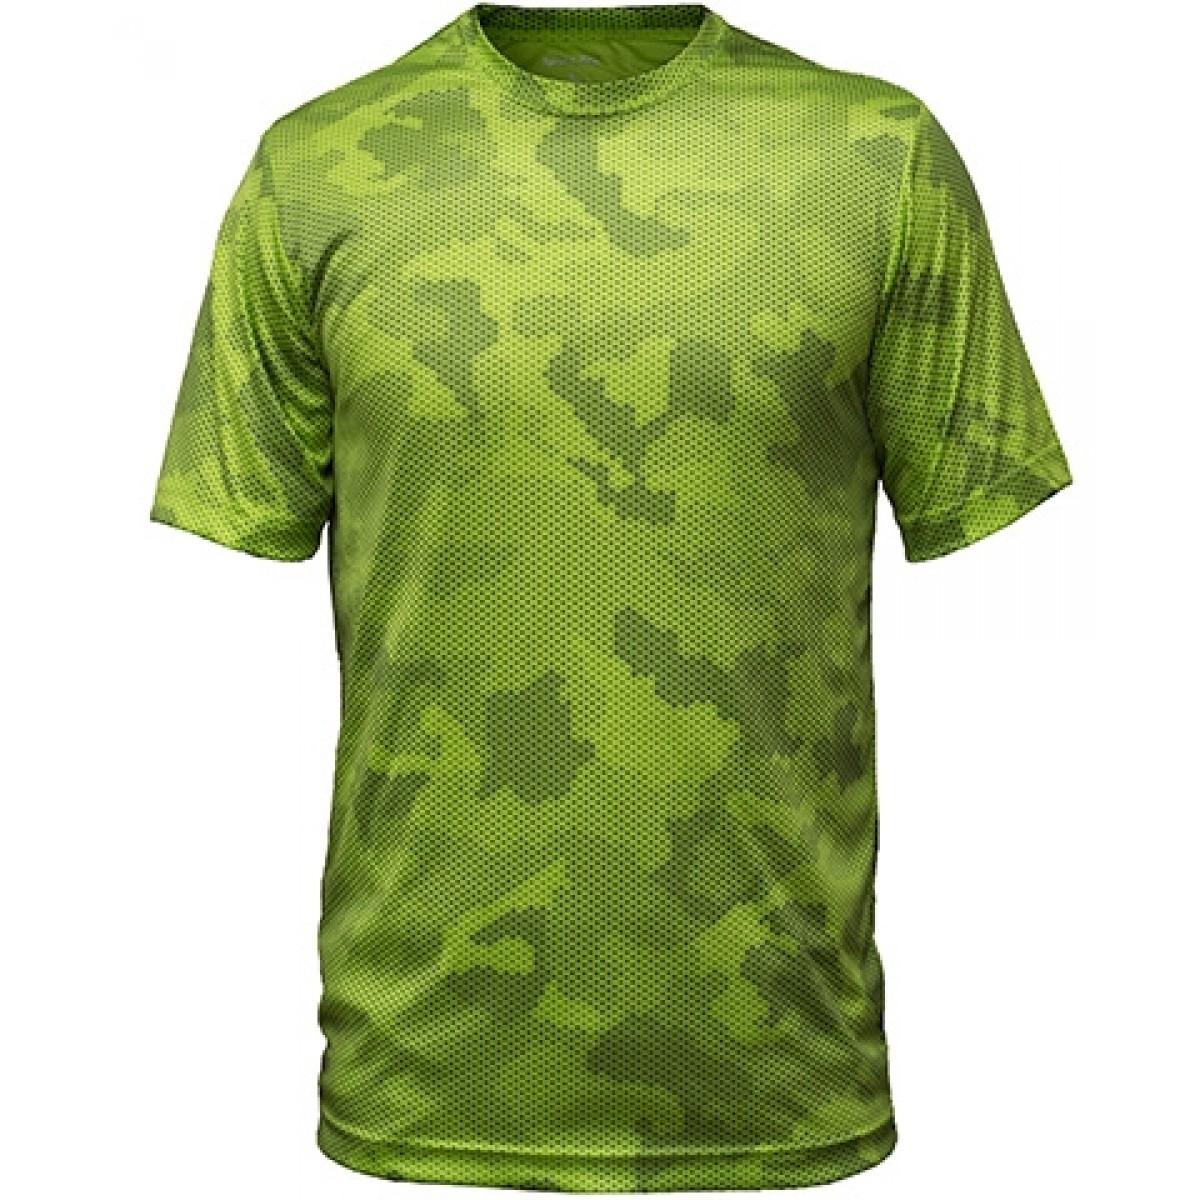 Camo Short Sleeve-Green-YS